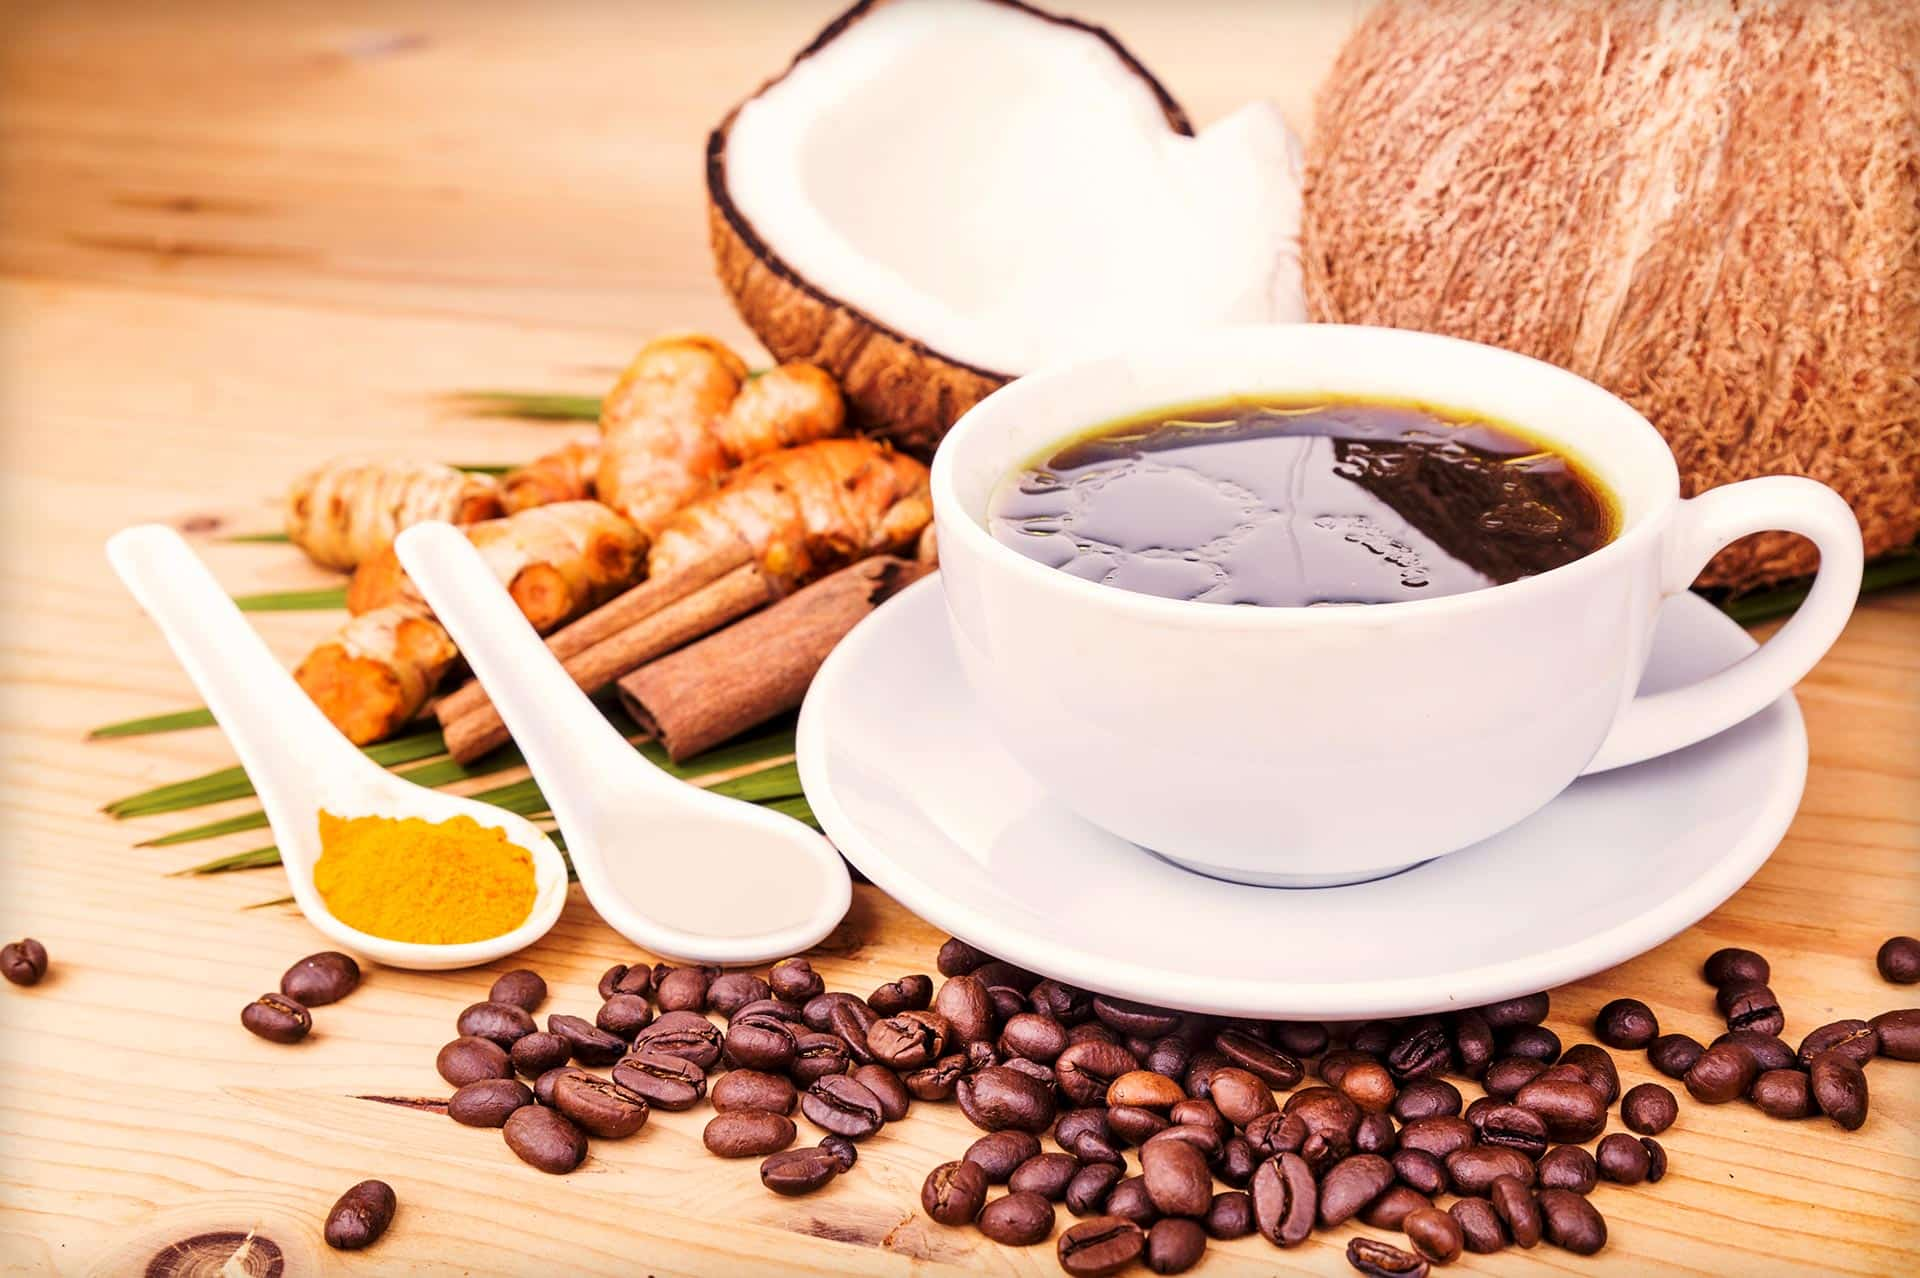 Keto kreme review keto coffee